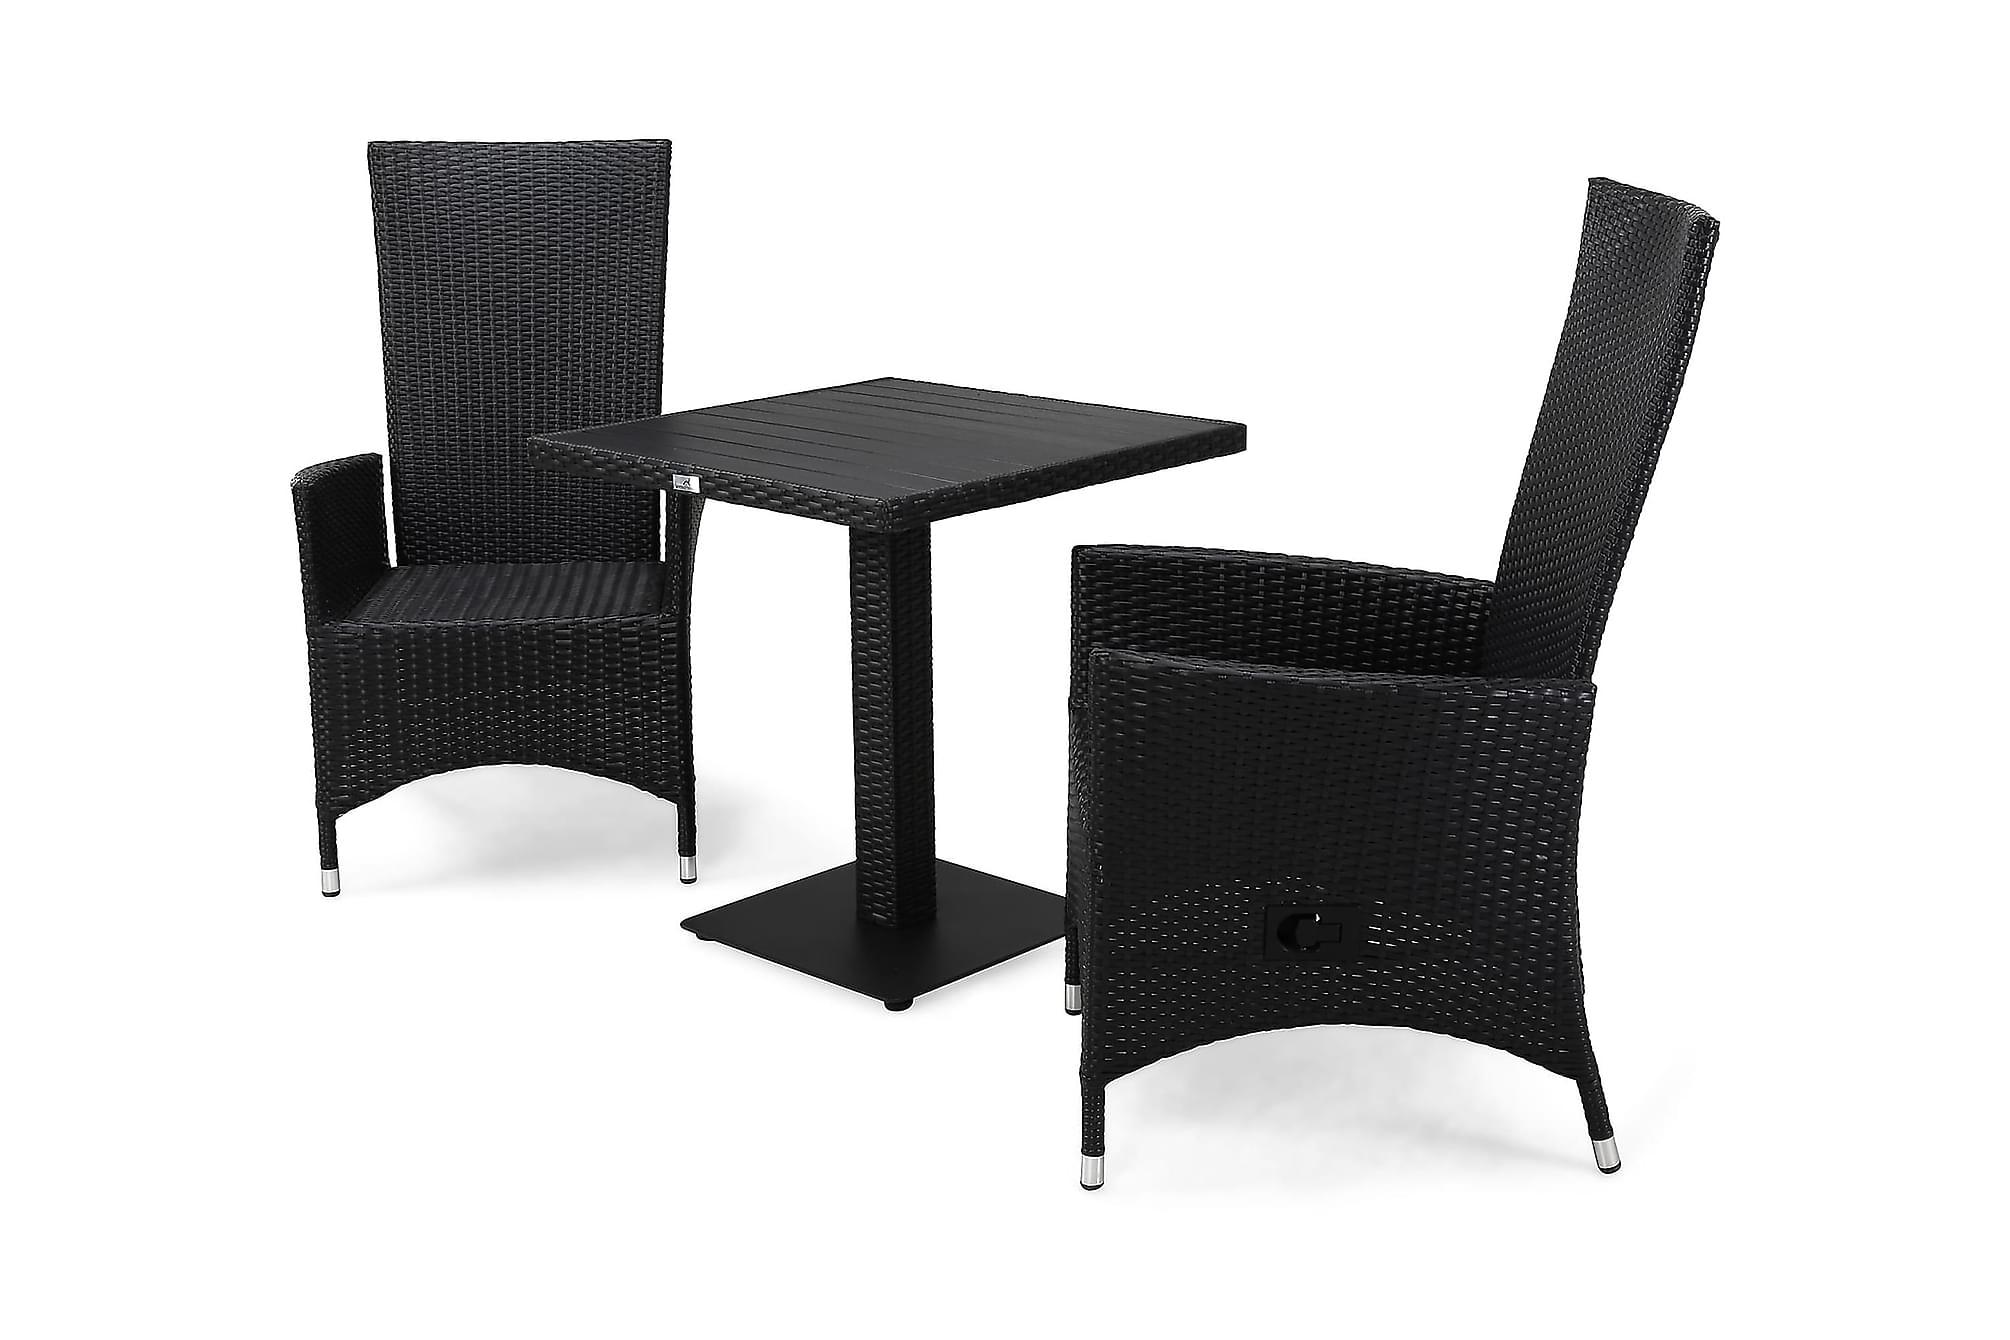 BAHAMAS Cafébord 70 + 2 JENNY Fåtölj Svart